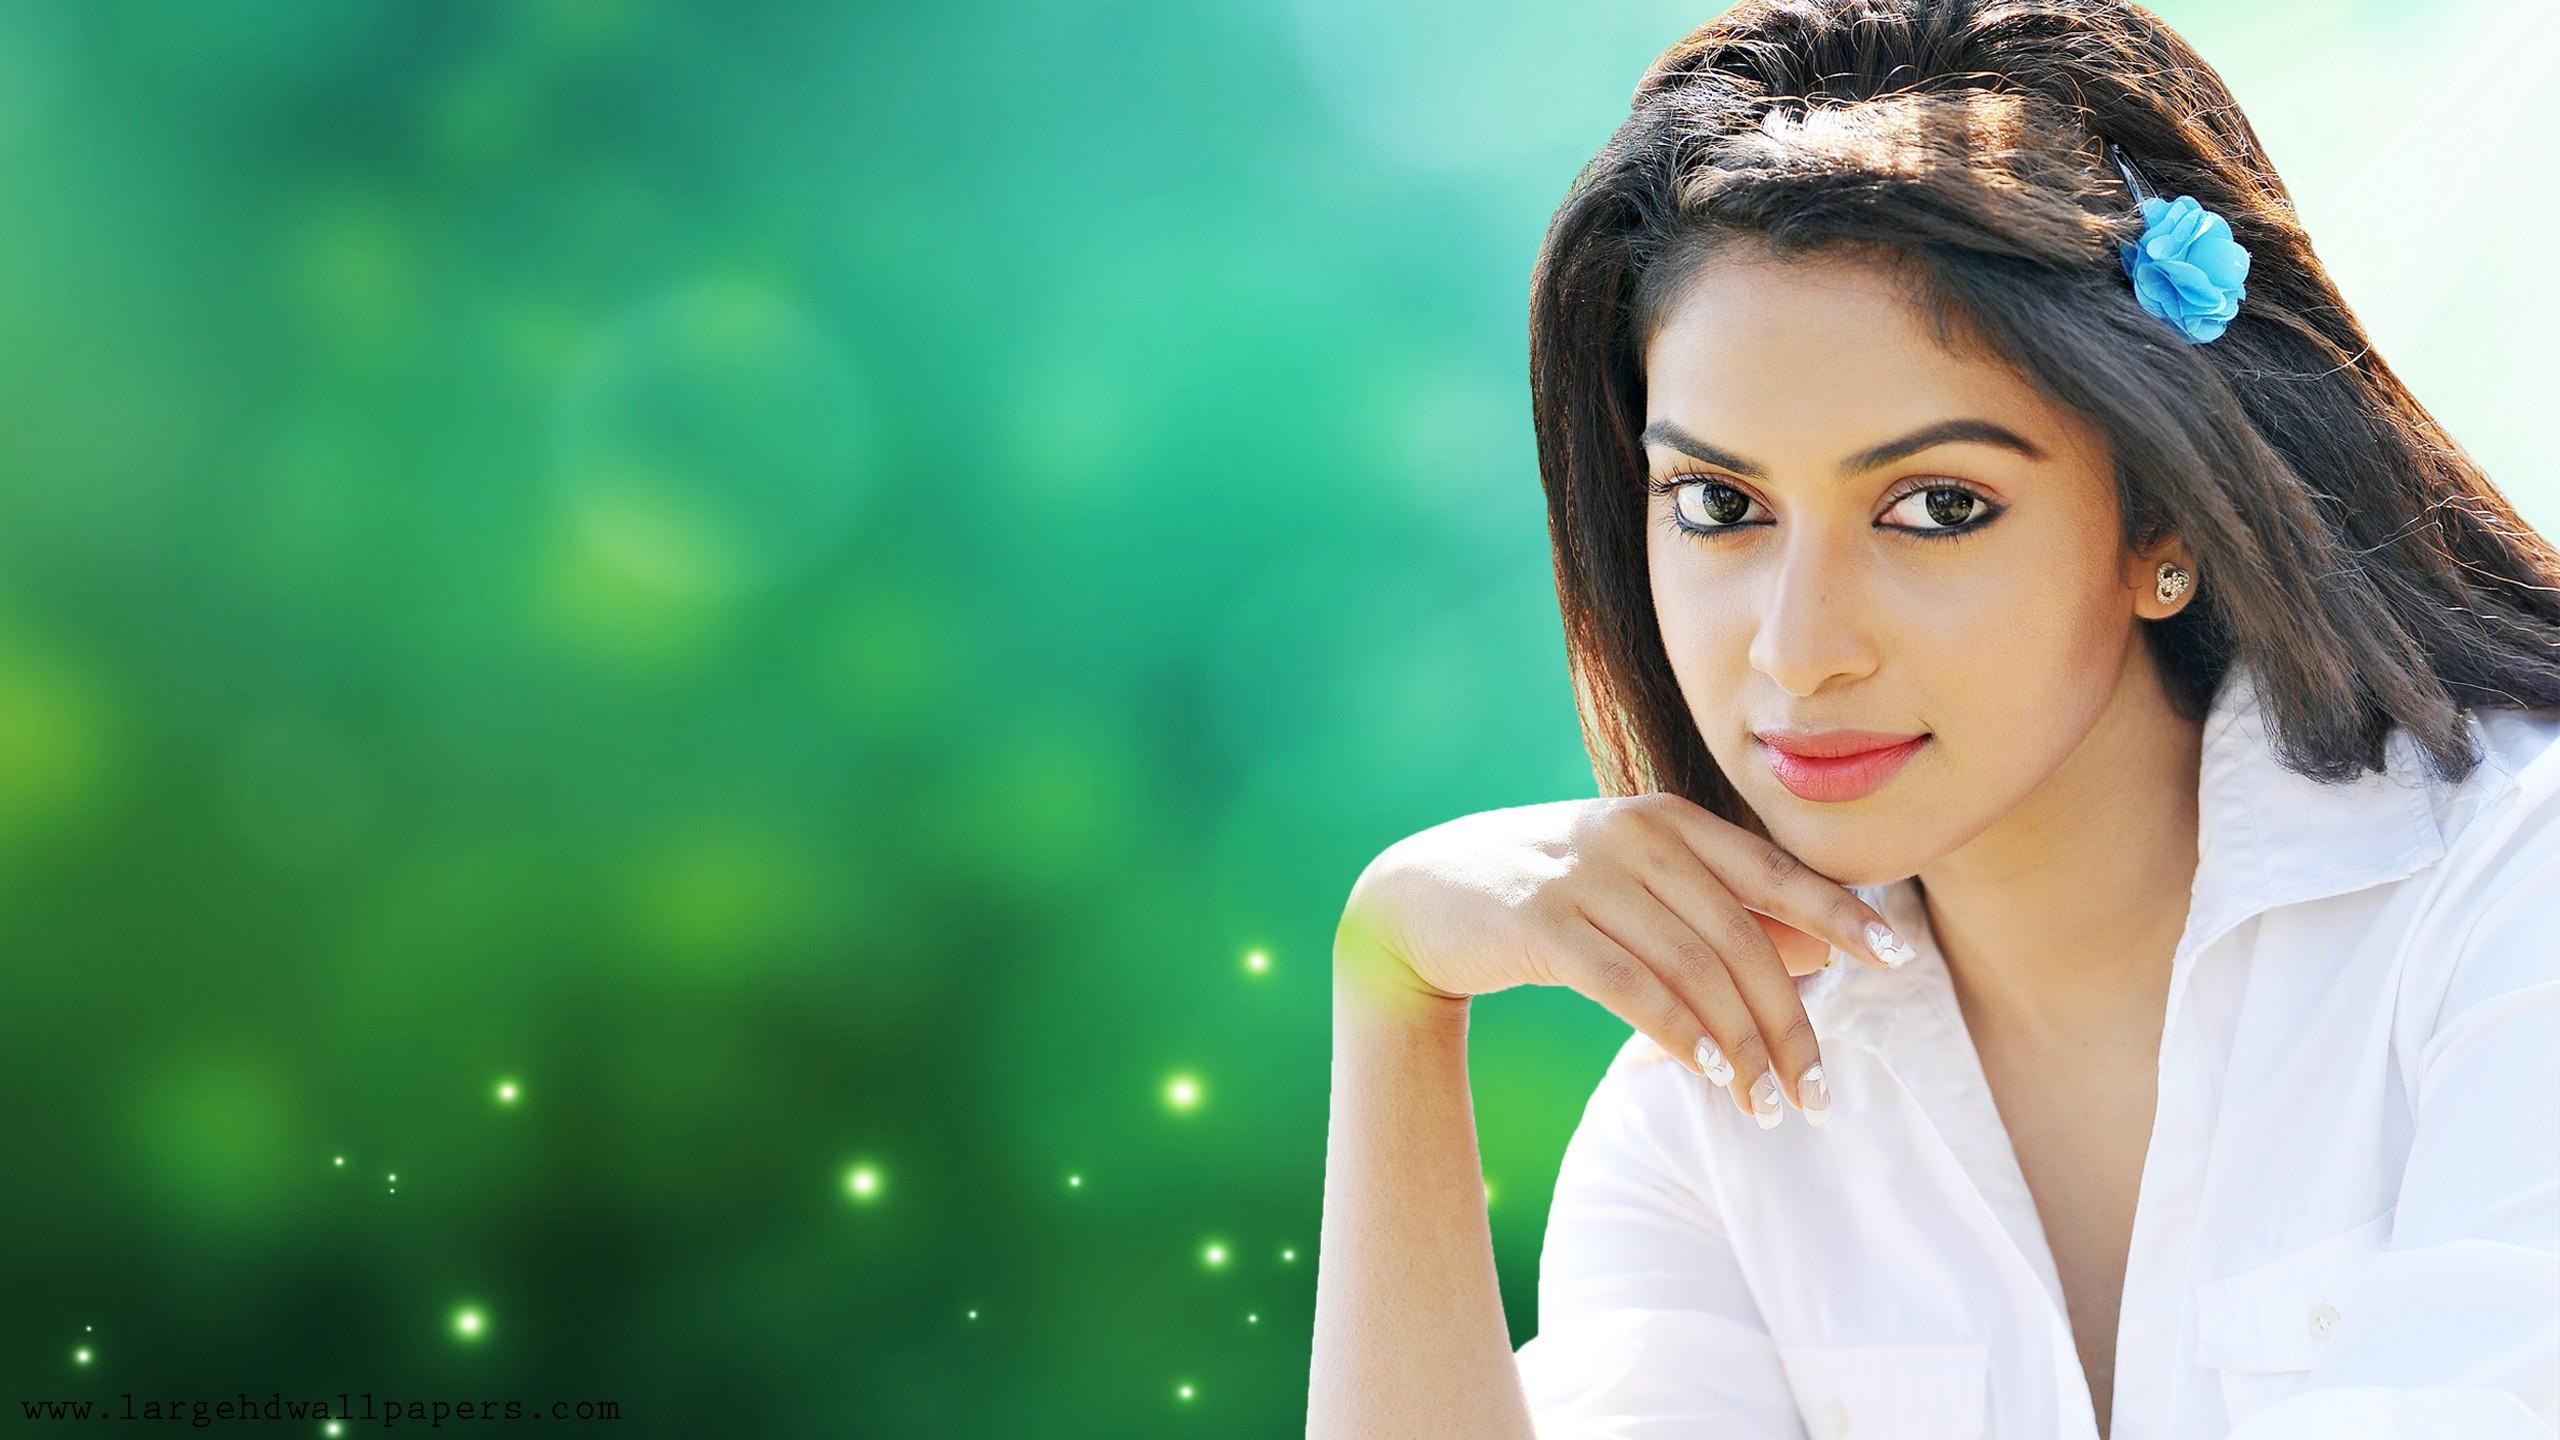 Amala Paul Sex Images amala paul cute hd wallpapers indian actress hot pinterest